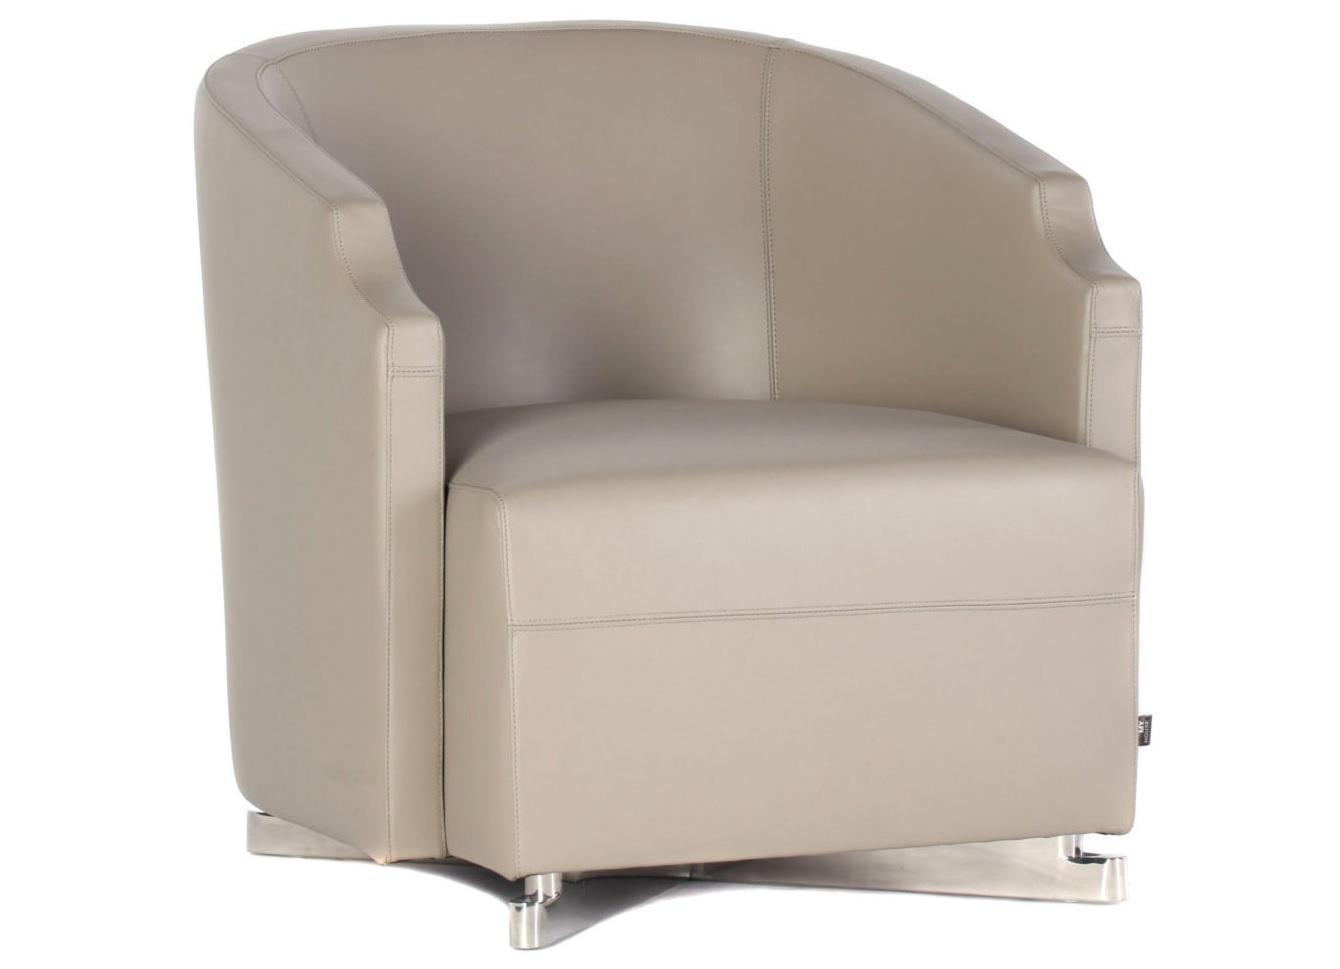 Кресло Arma creamКожаные кресла<br><br><br>kit: None<br>gender: None